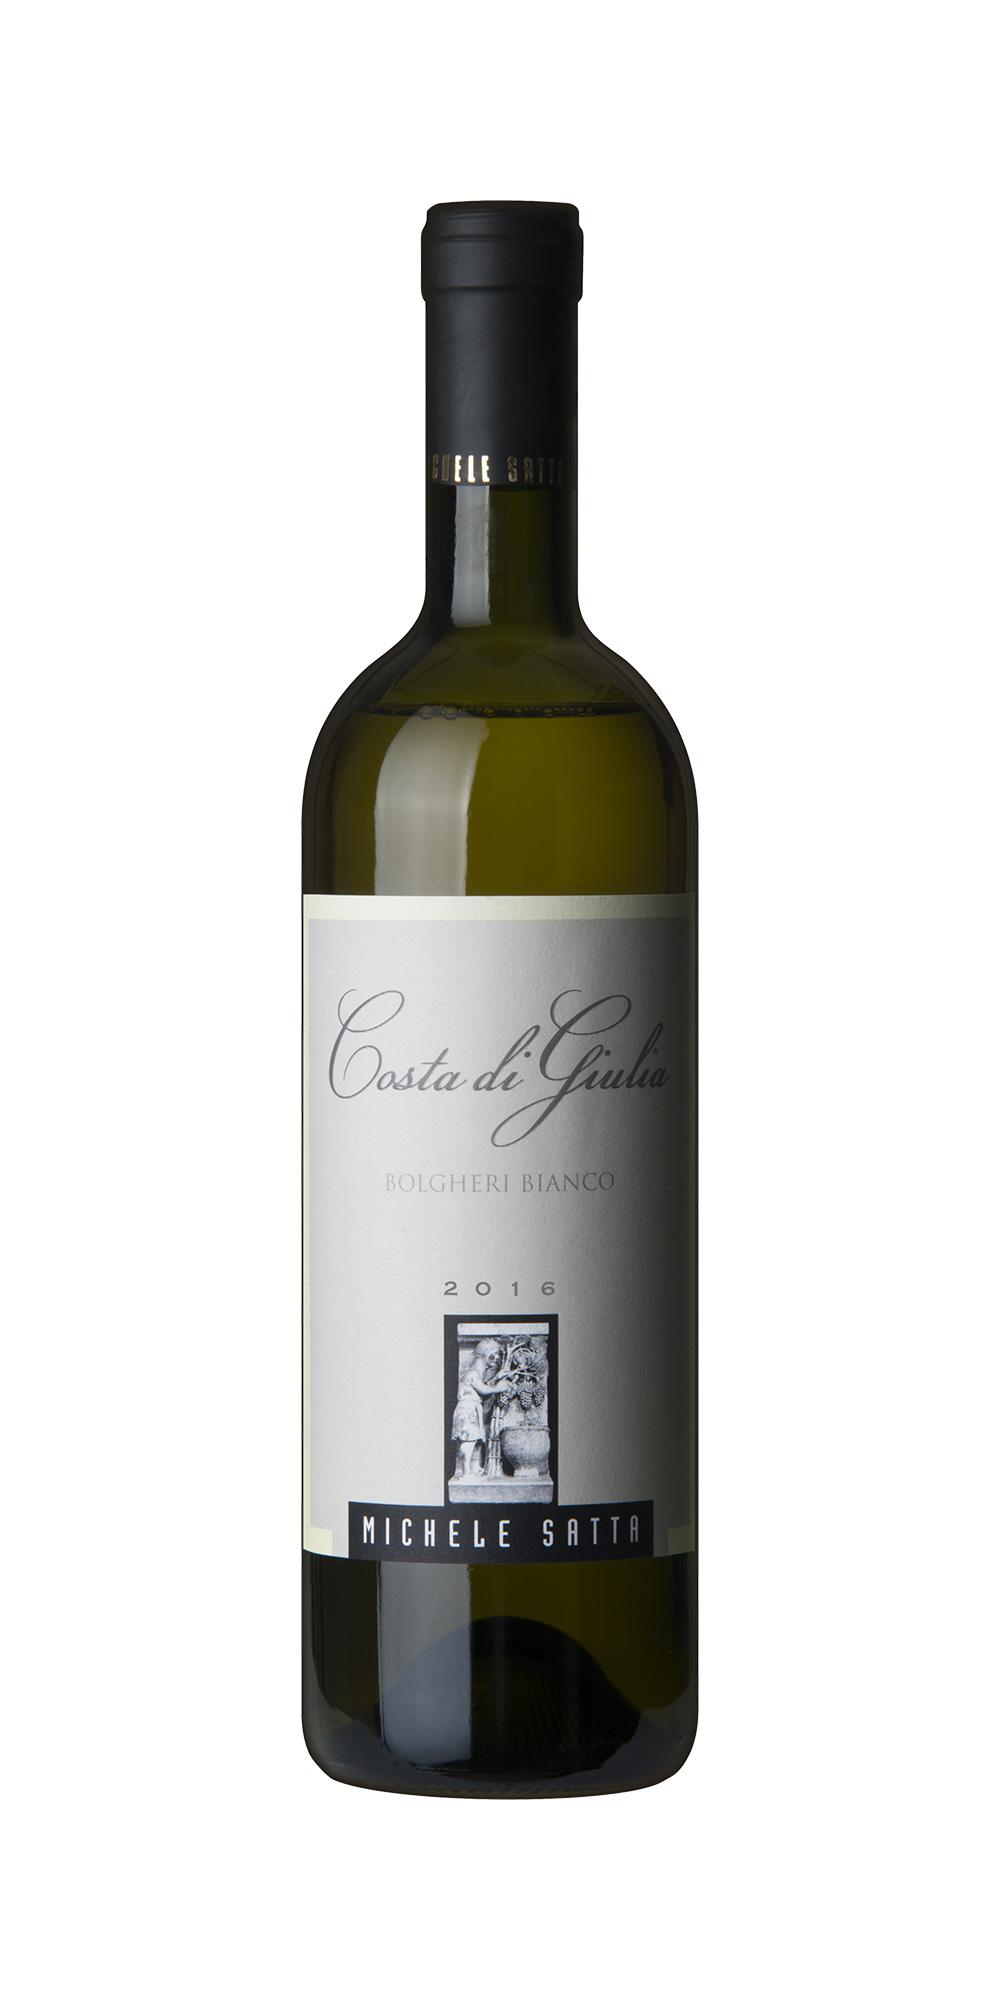 Vino bianco Costa di Giulia Bolgheri Bianco